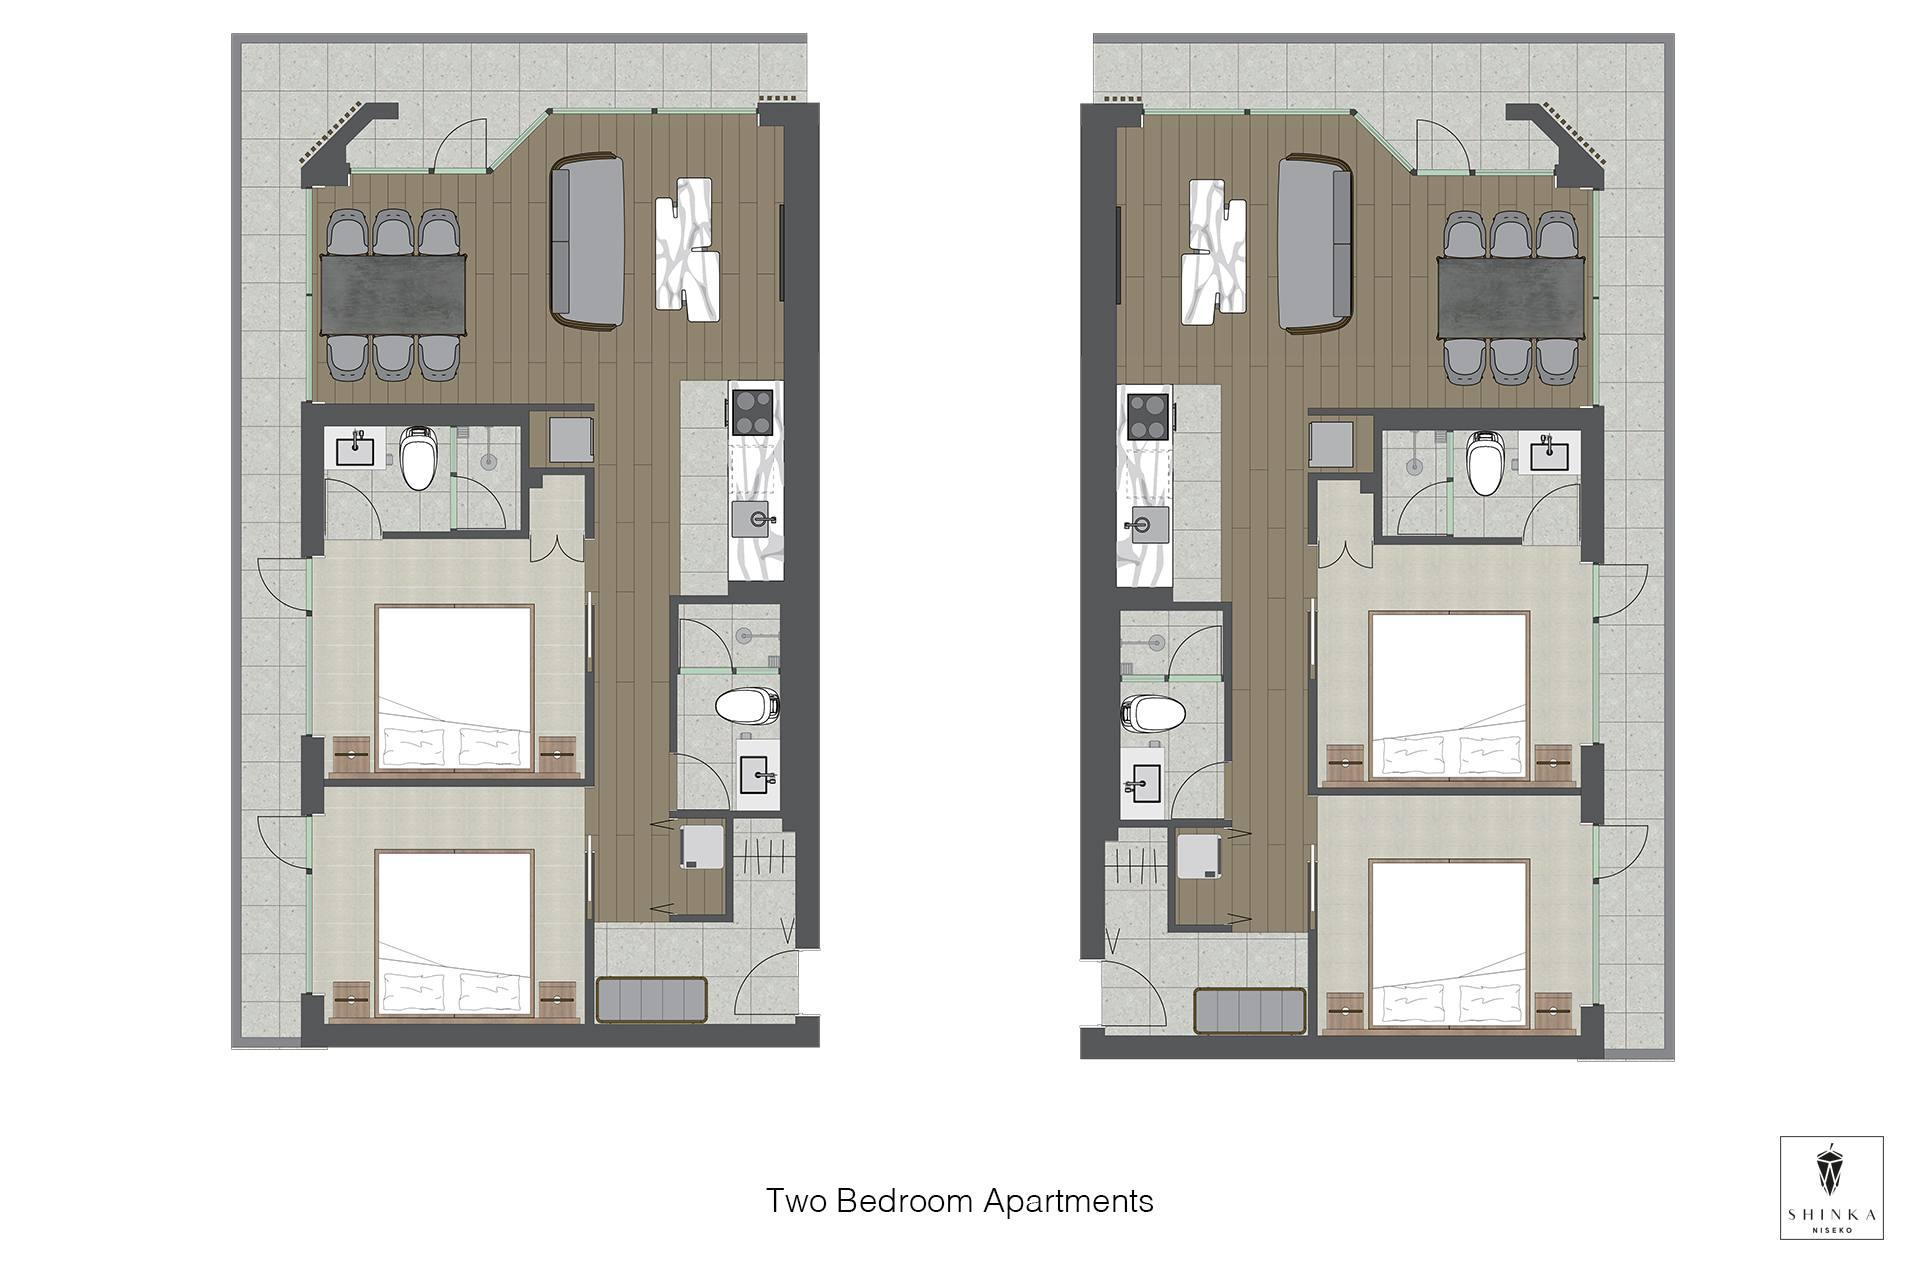 Shinka 2BR Floorplan